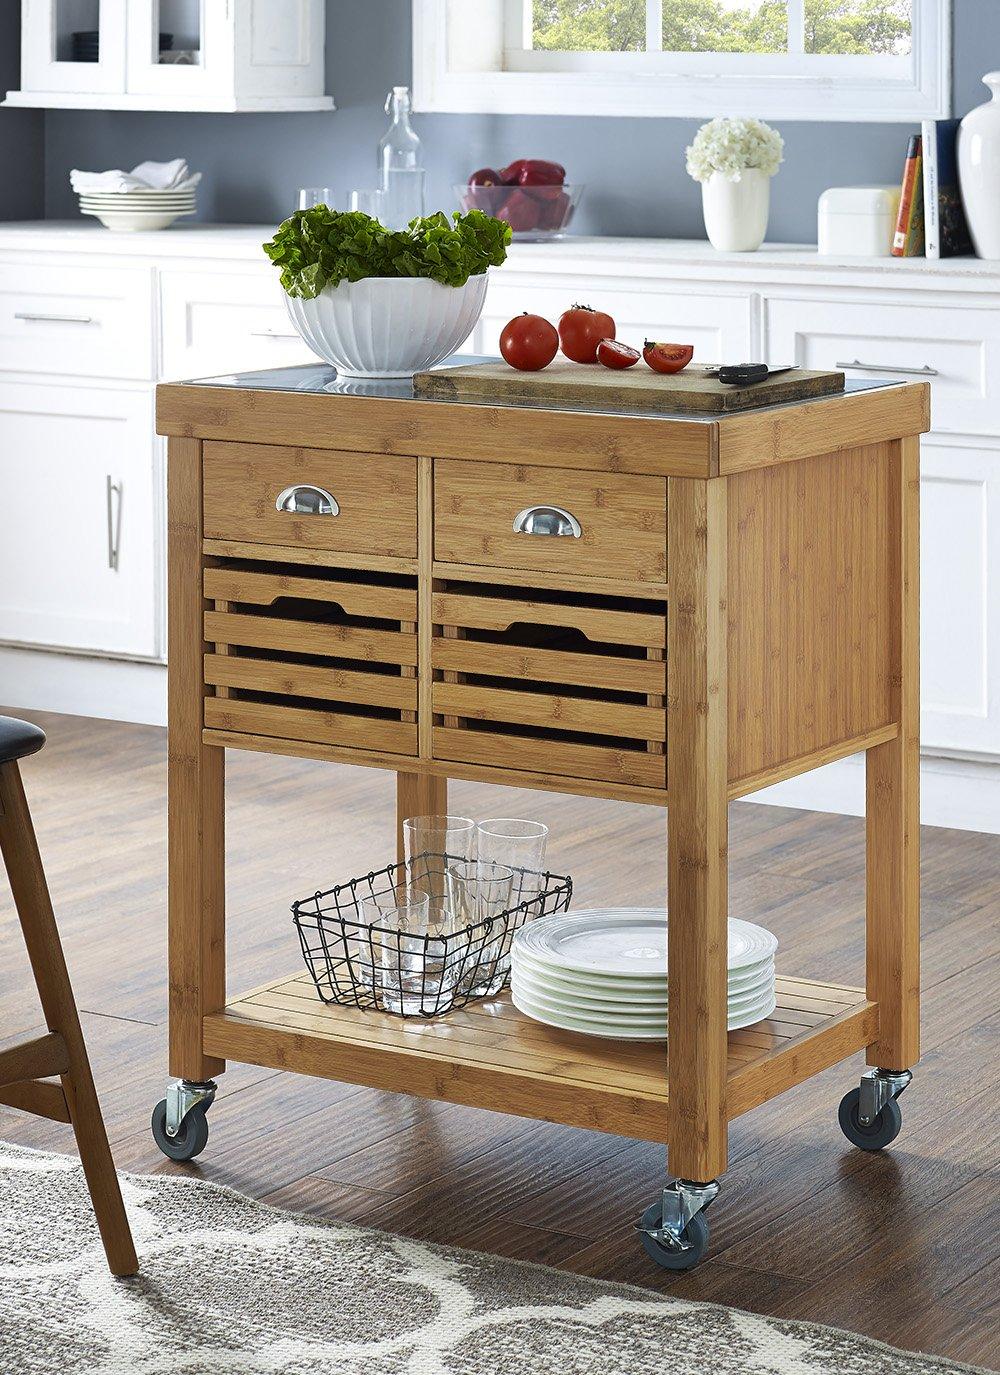 amazon com boraam 50650 kenta bamboo kitchen cart with stainless rh amazon com stainless steel kitchen work table cart with bamboo top